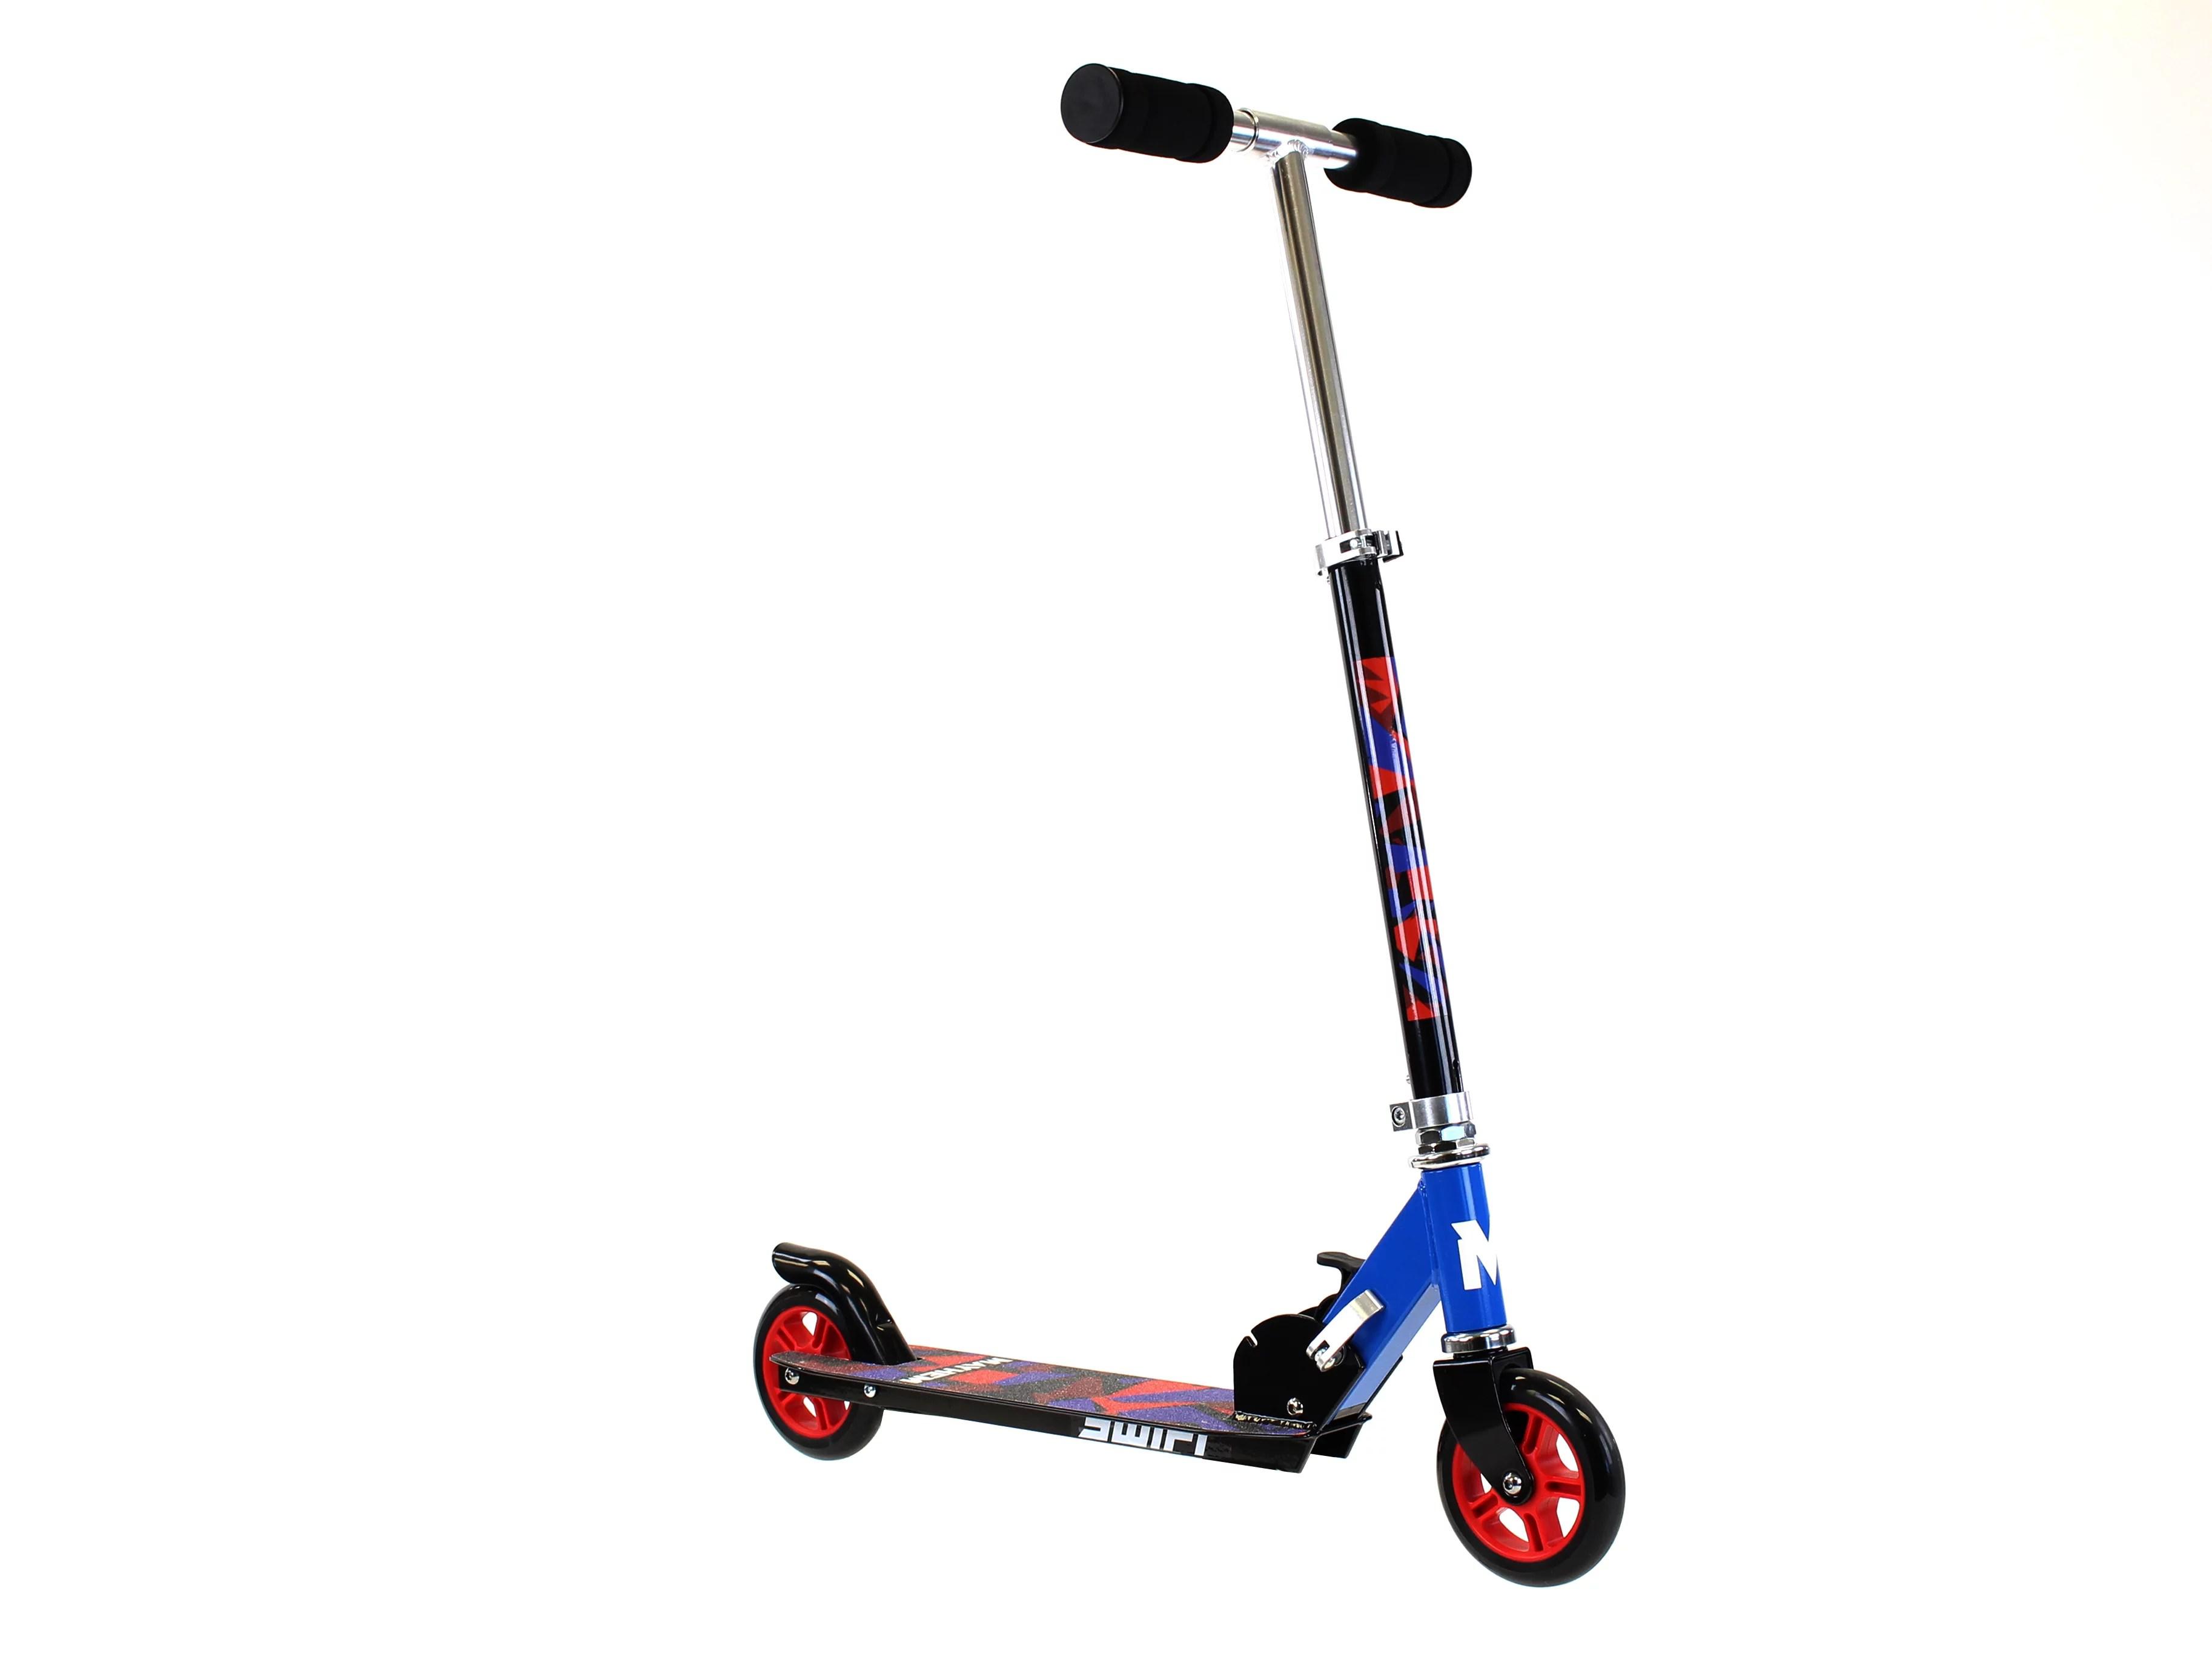 Swift Mayhem Kids Kick Scooter With Adjustable Handlebar